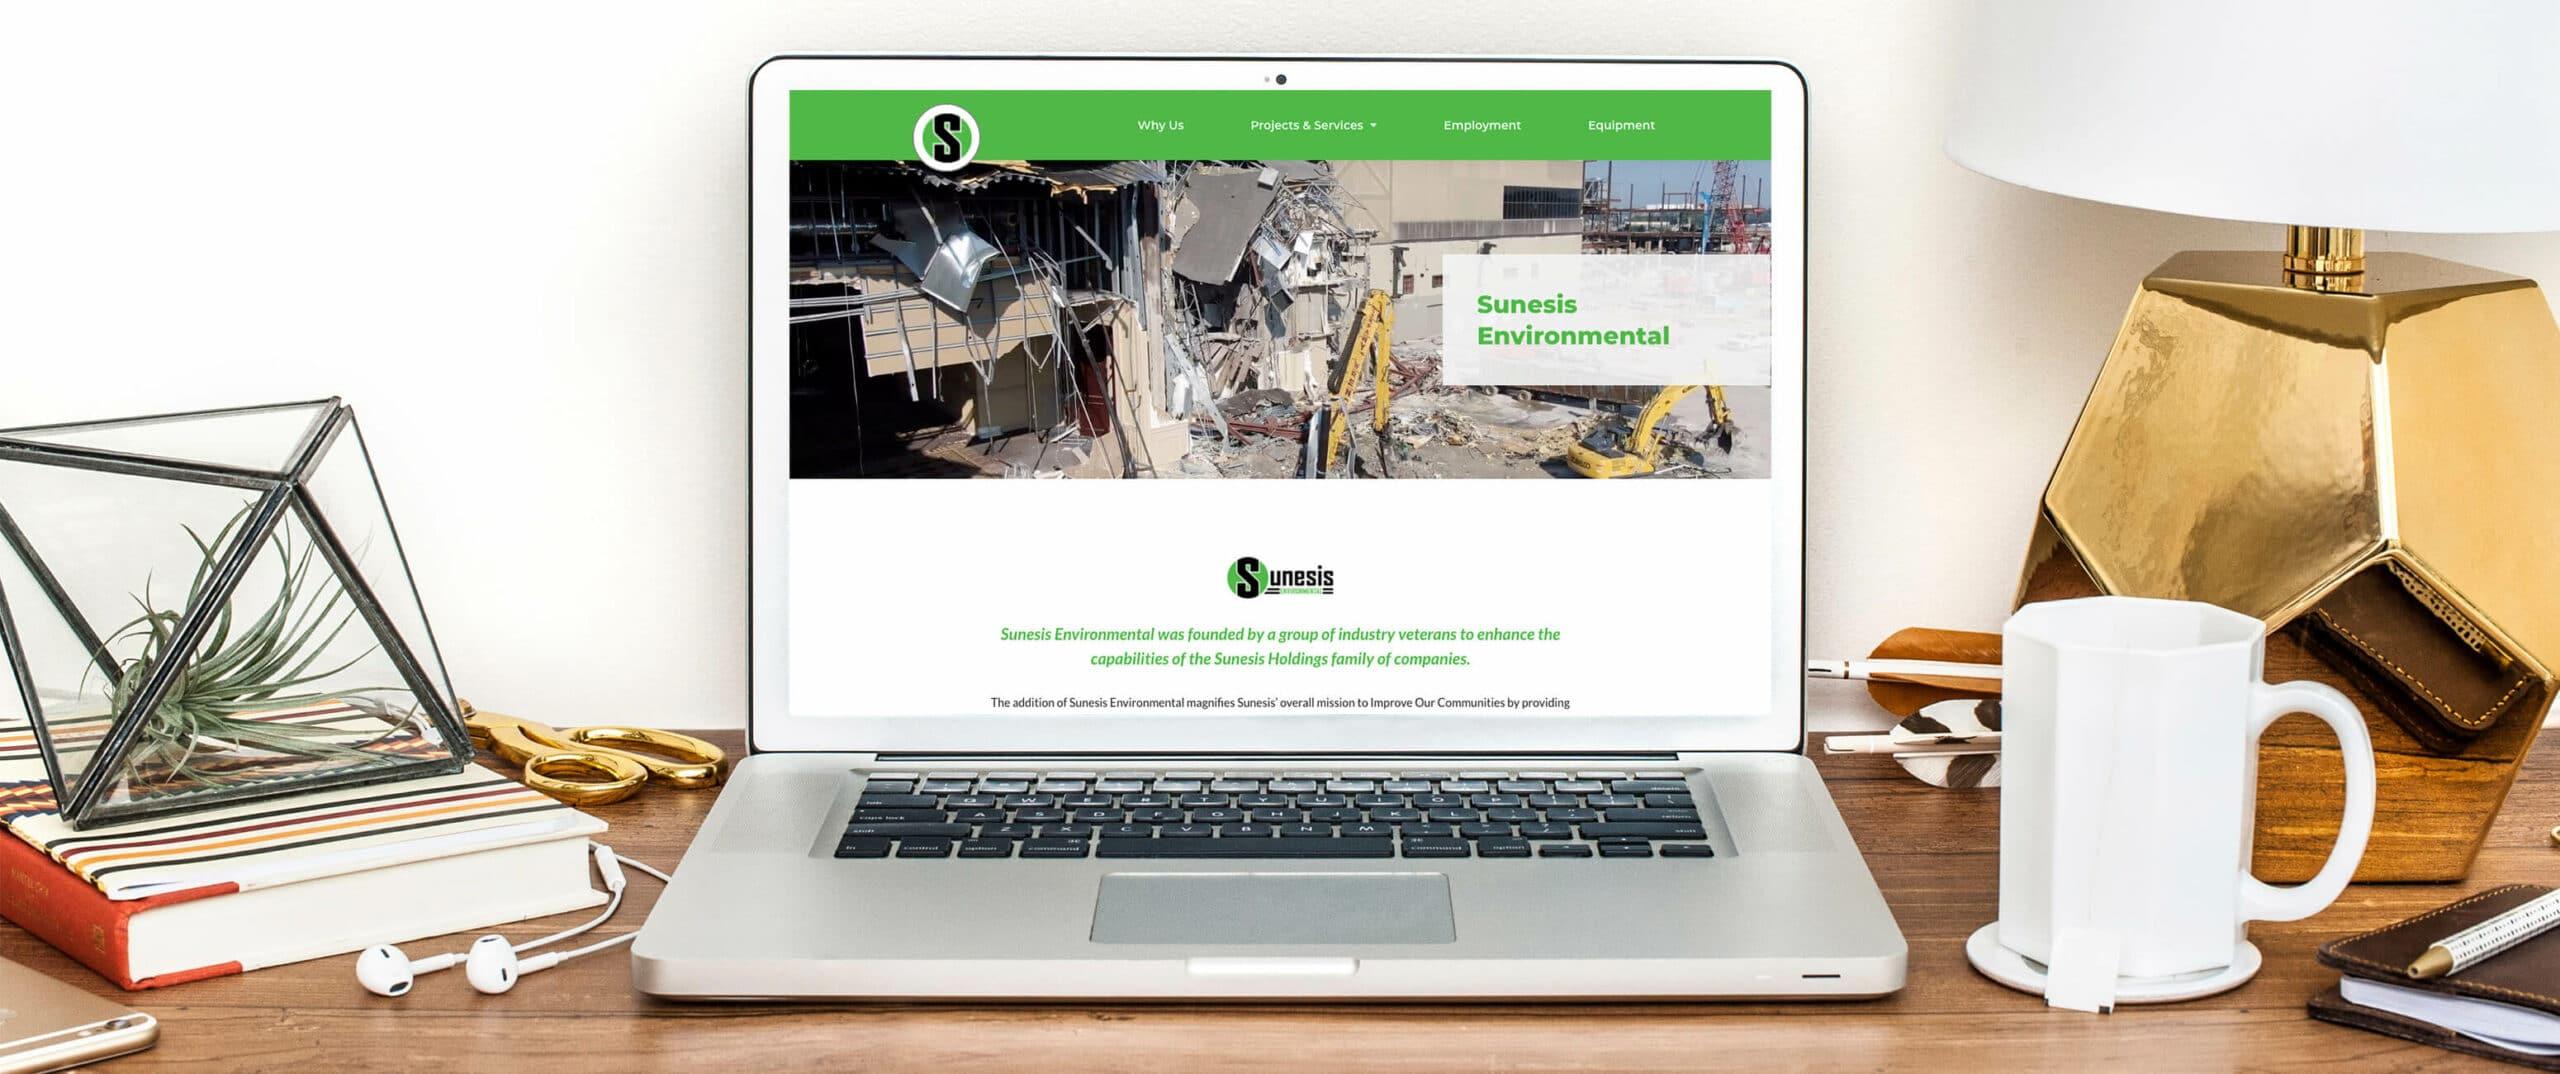 Sunesis Environmental Civil Construction Website desktop view - Construction Website Example and Portfolio